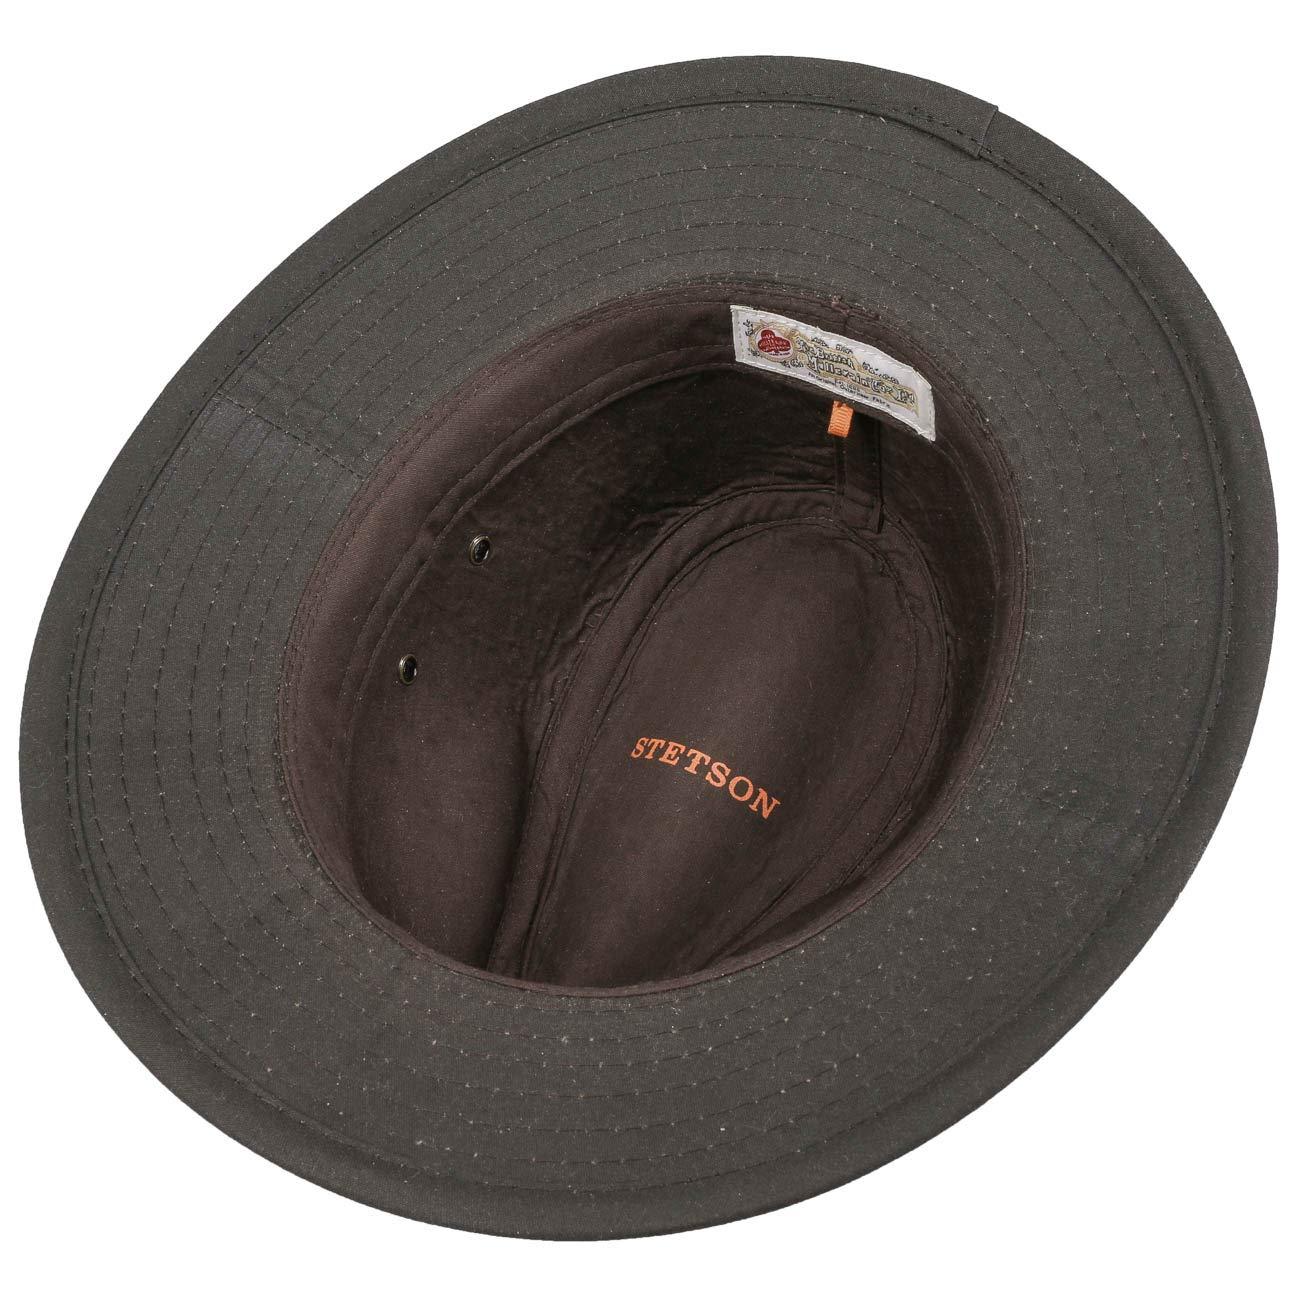 e161b8bf758 Stetson Avasun Waxed Cotton Traveller outdoor hat cloth  Amazon.co.uk   Clothing